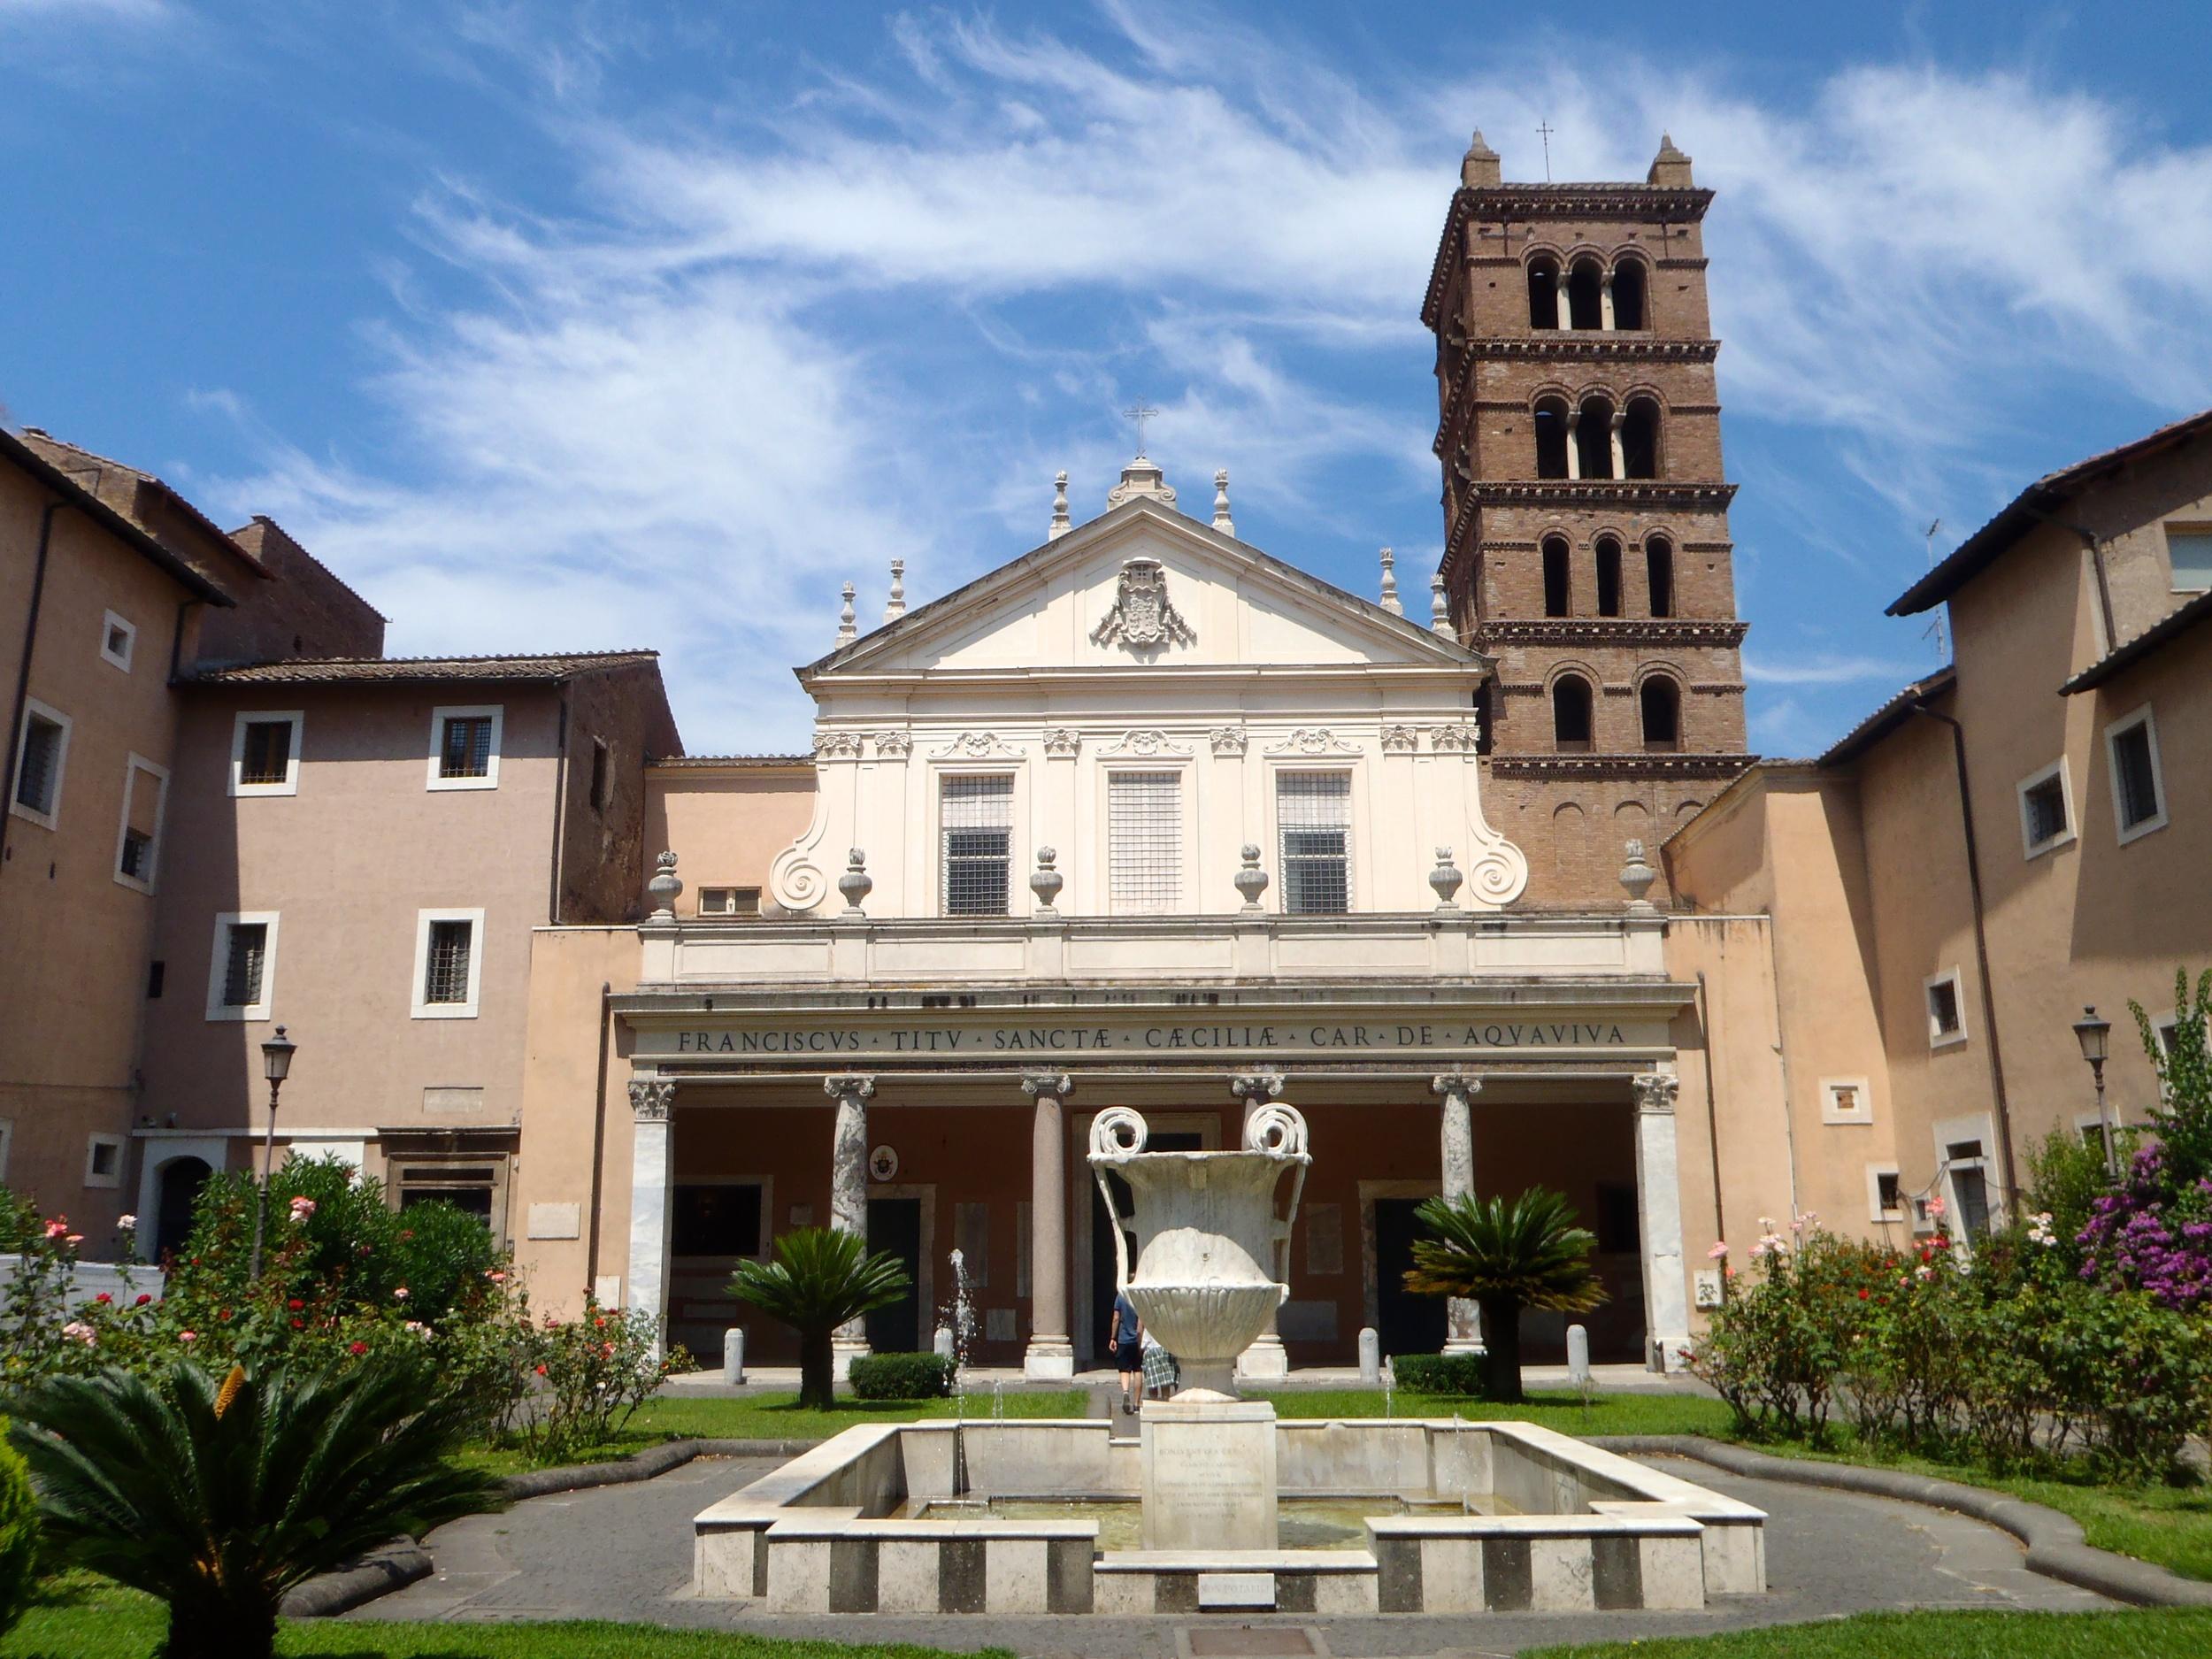 CRO Italy web 2013 - 081.jpg